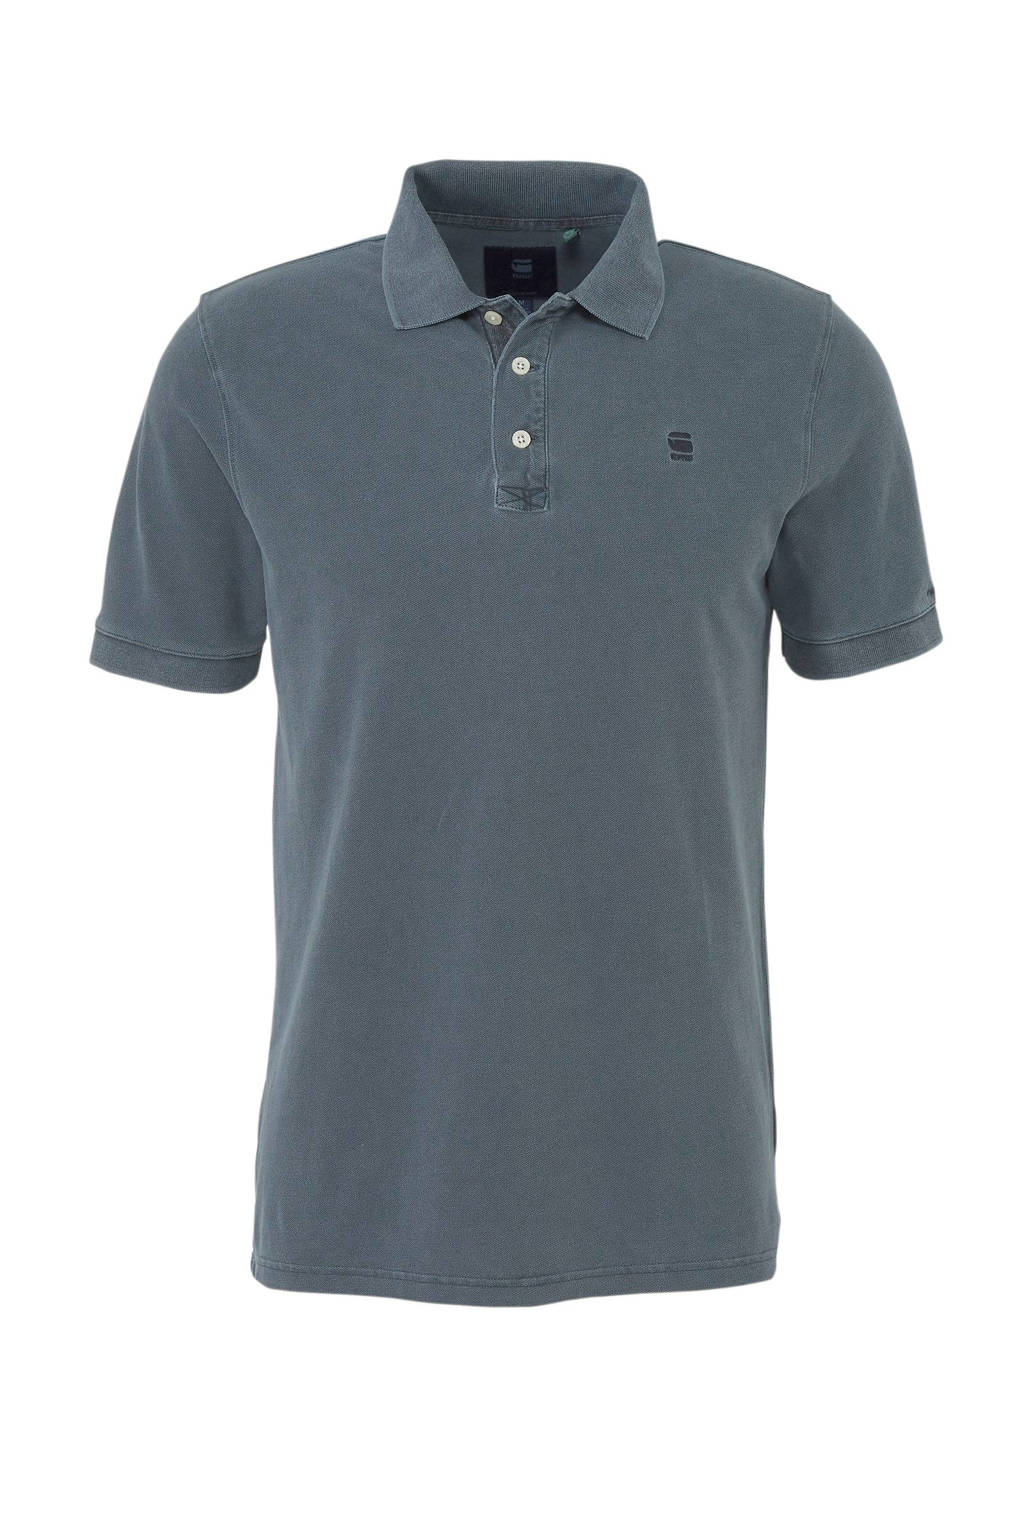 G-Star RAW regular fit polo met logo grijsblauw, Grijsblauw